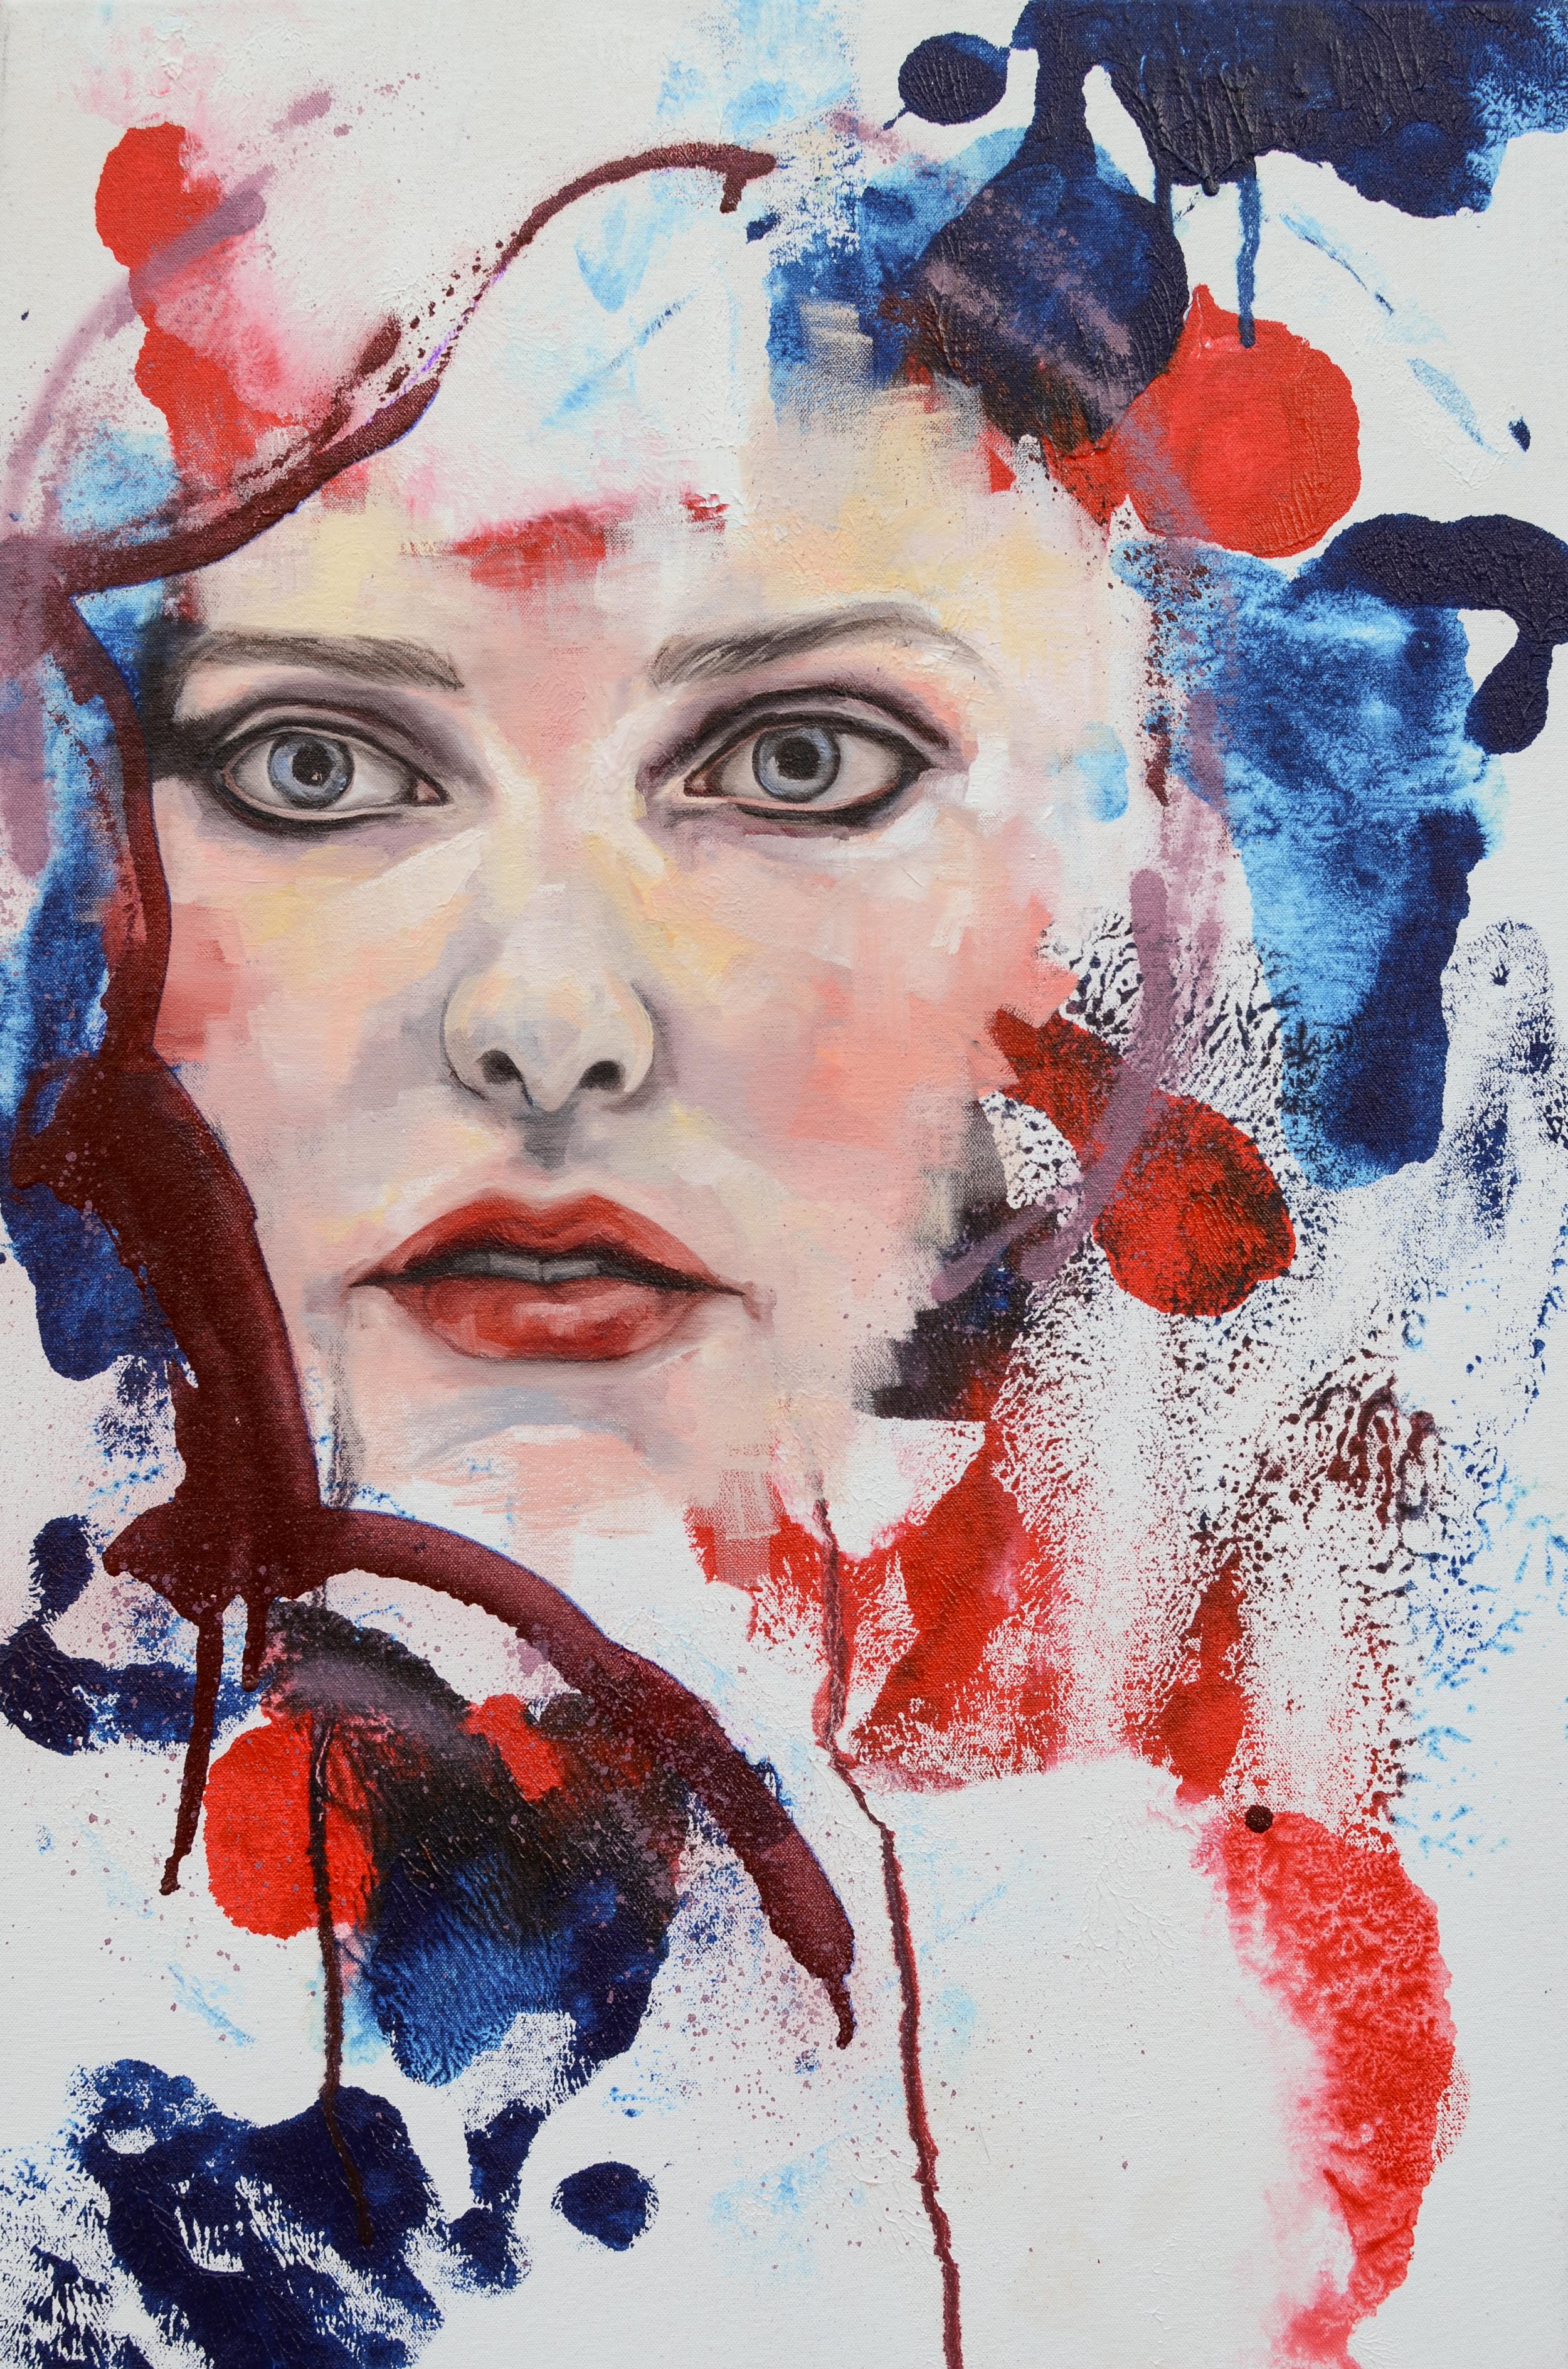 Dreamer, oil and spray enamel on canvas, 76x50cm, 2014 LG.jpg